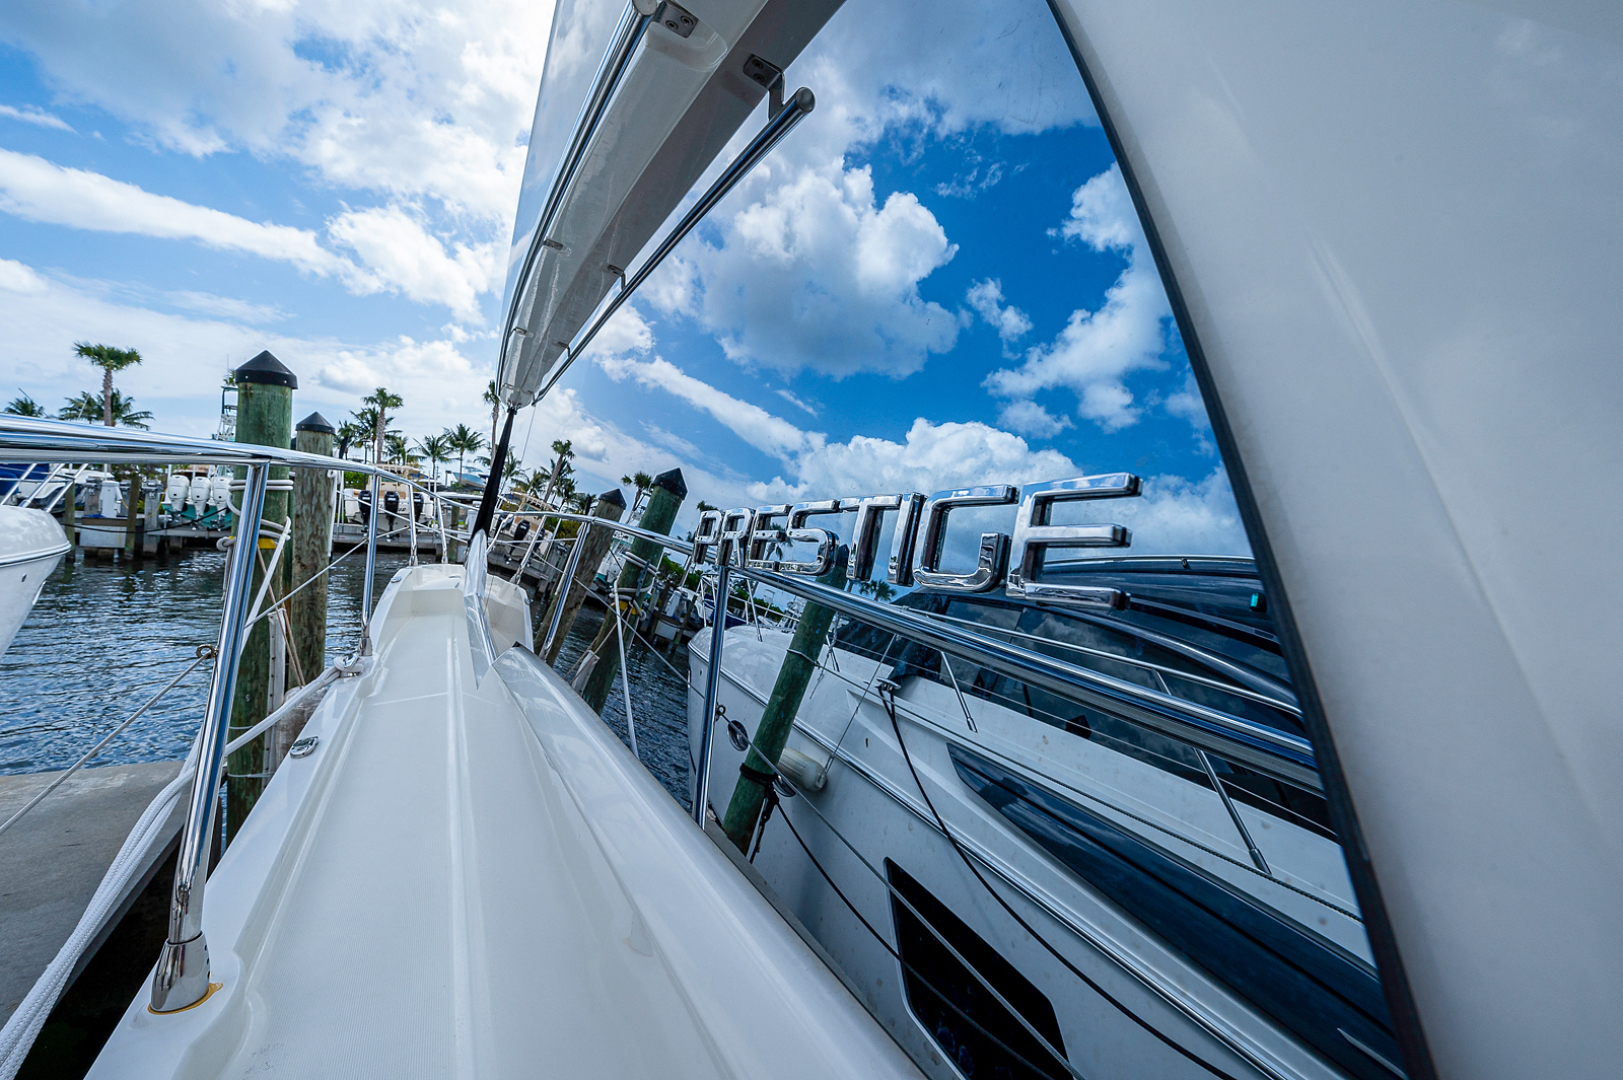 Prestige-460 Flybridge 2018-SEAQUEL Palm Beach Gardens-Florida-United States-Walkaround/Bow-1351145 | Thumbnail